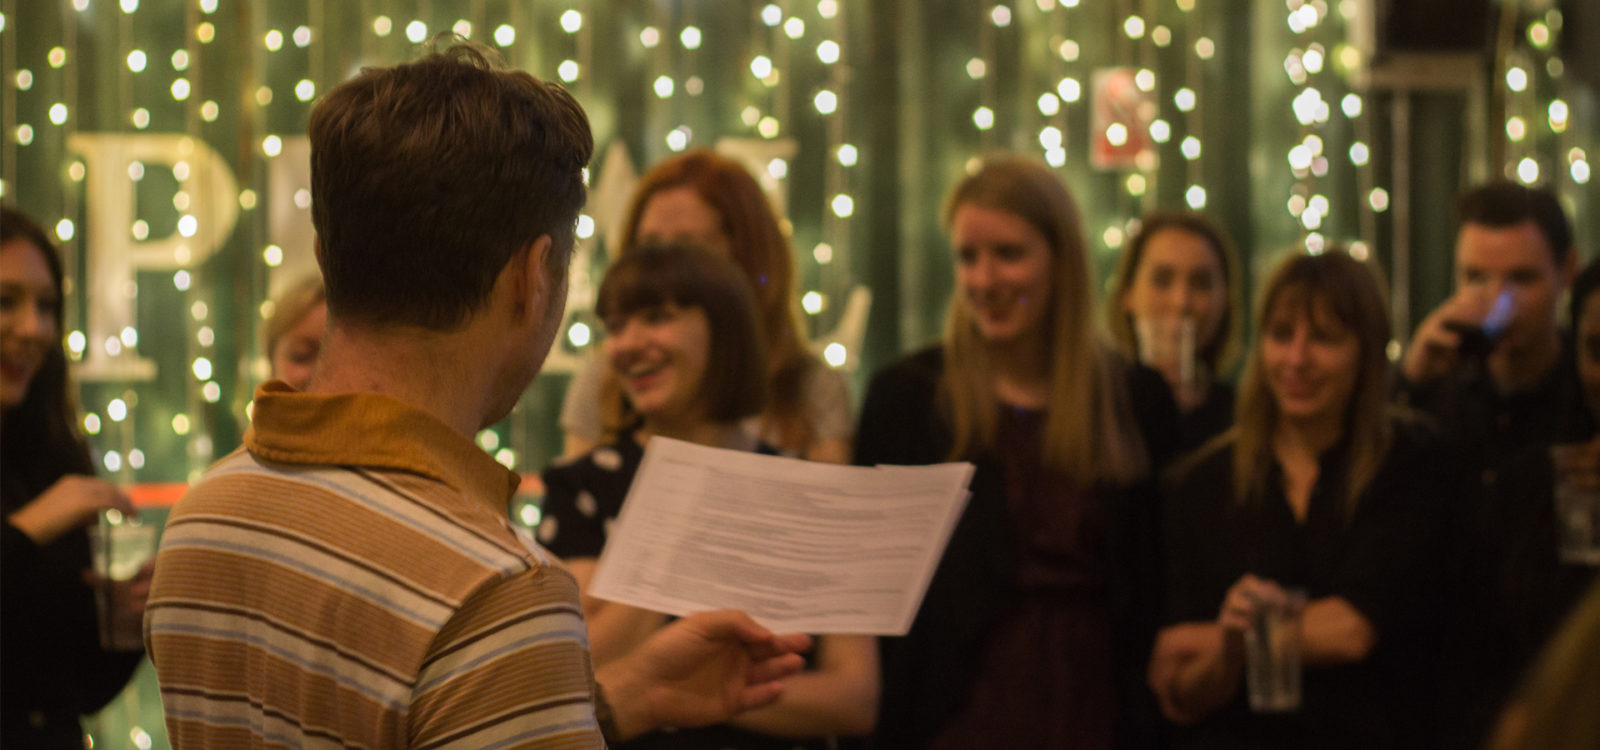 Agency Christmas party speech